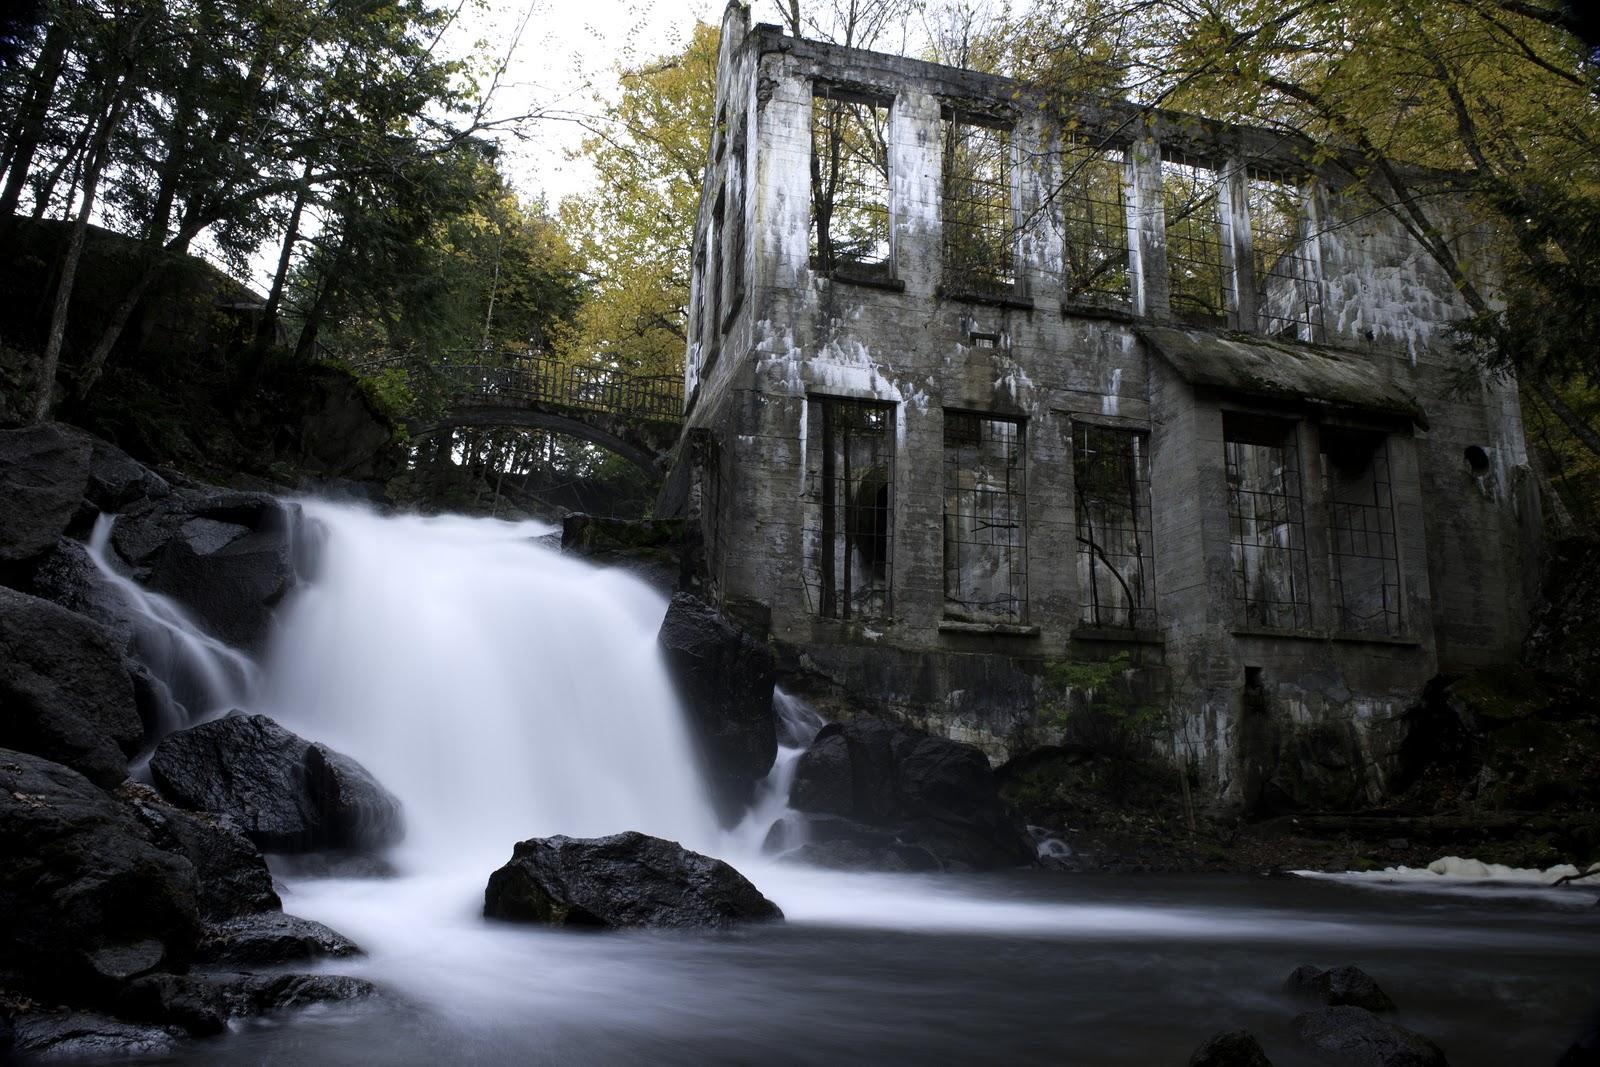 Abandoned Mill – Ontario, Canada